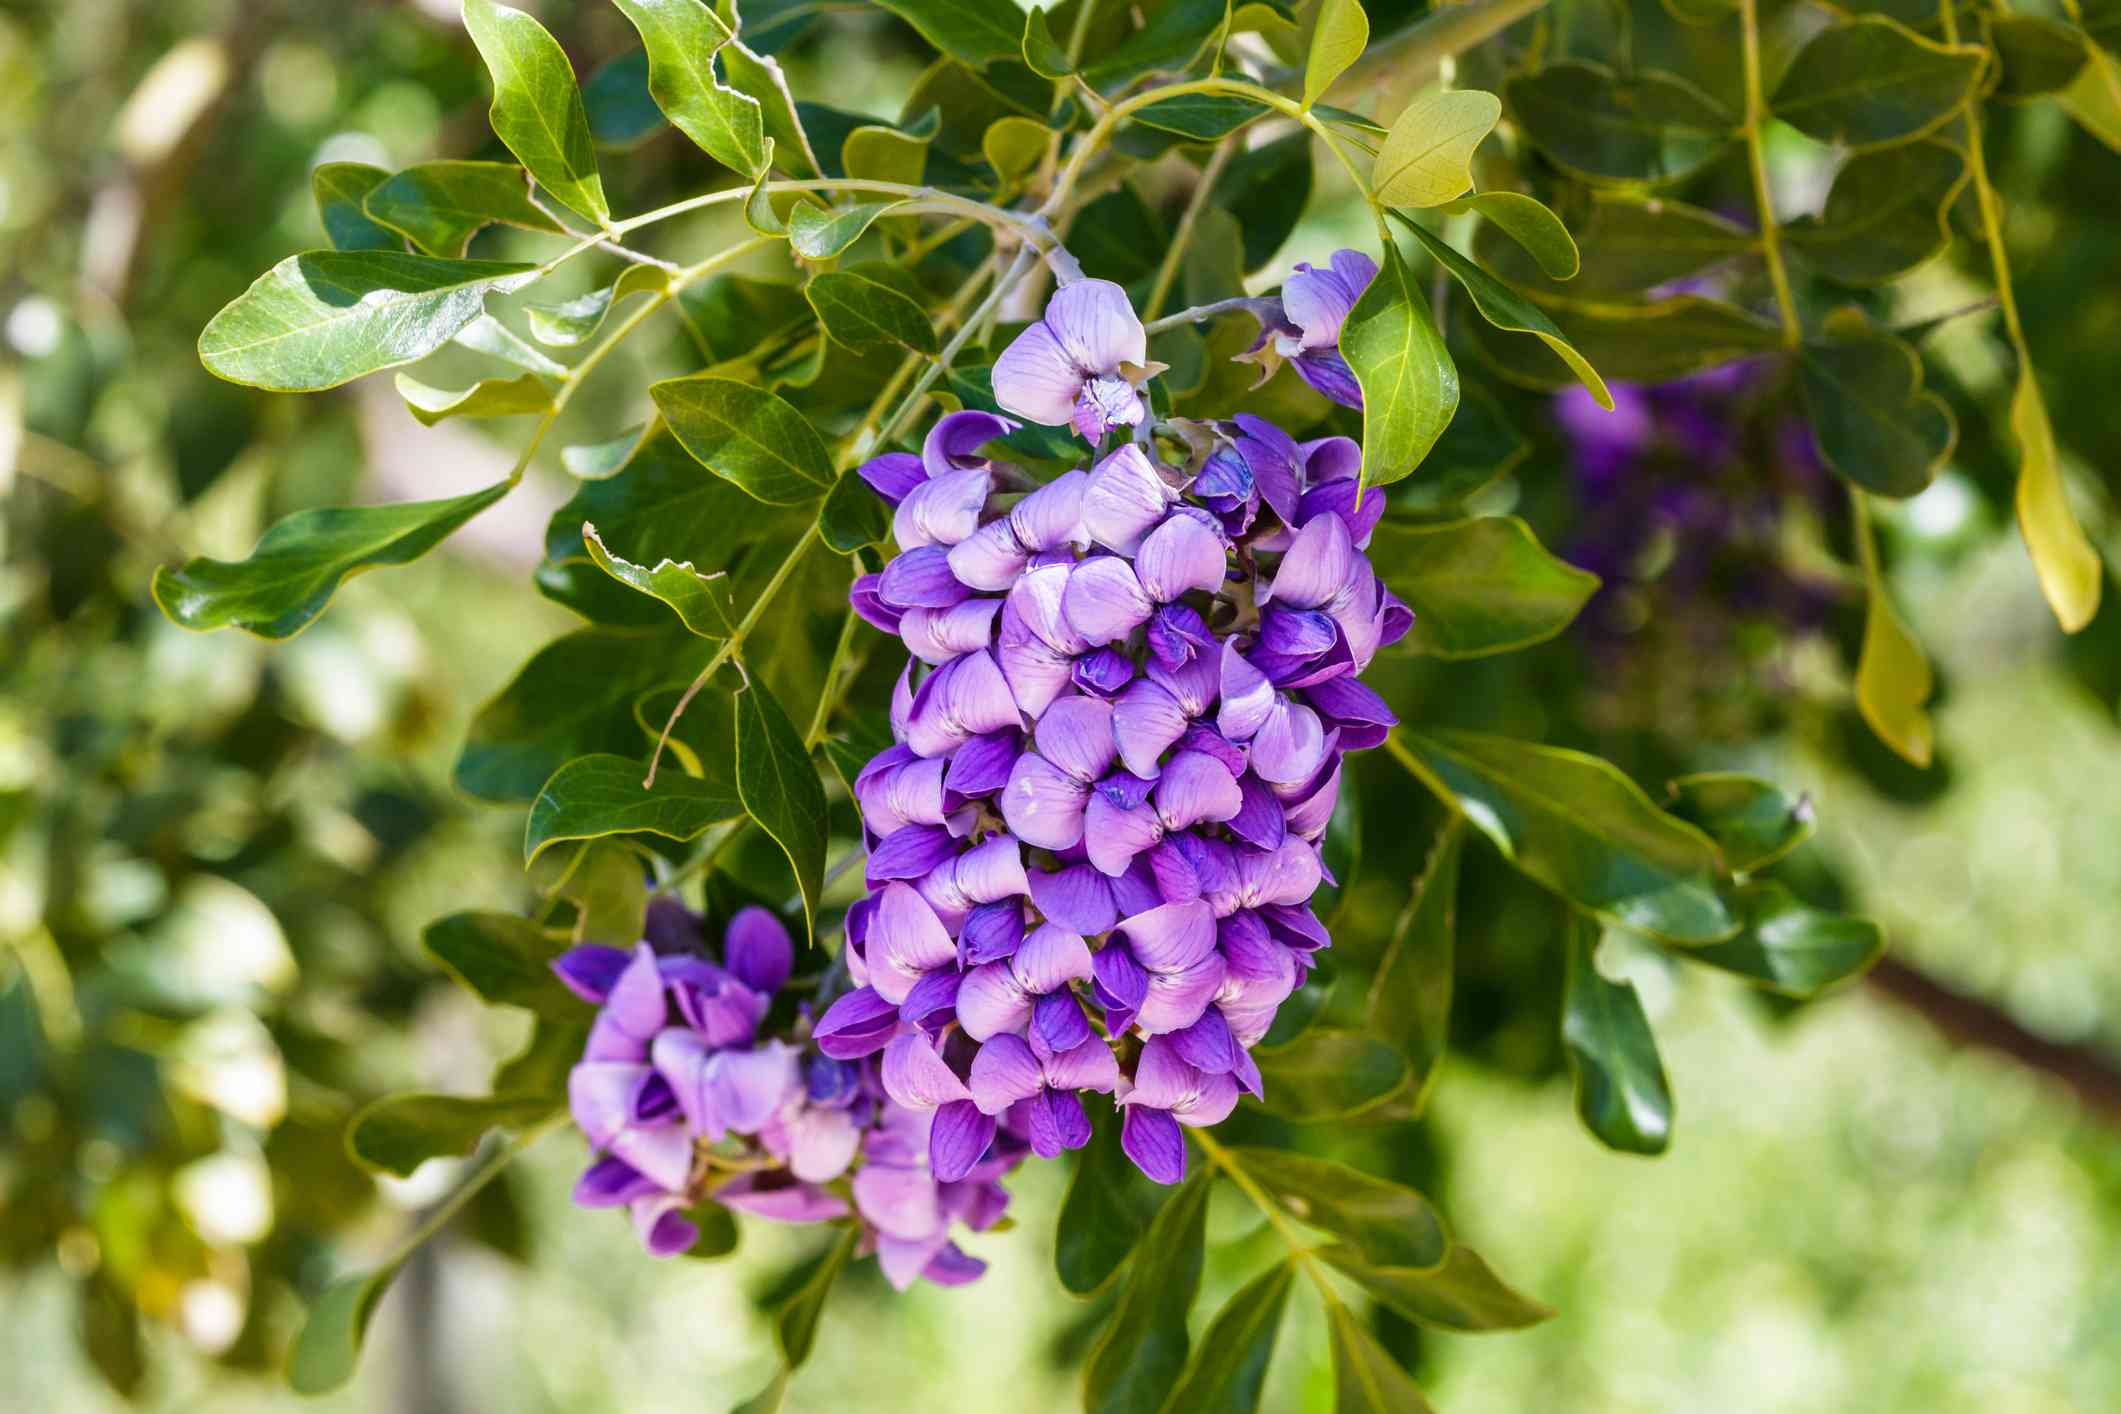 Texas Mountain Laurel (Dermatophyllum secundiflorum)